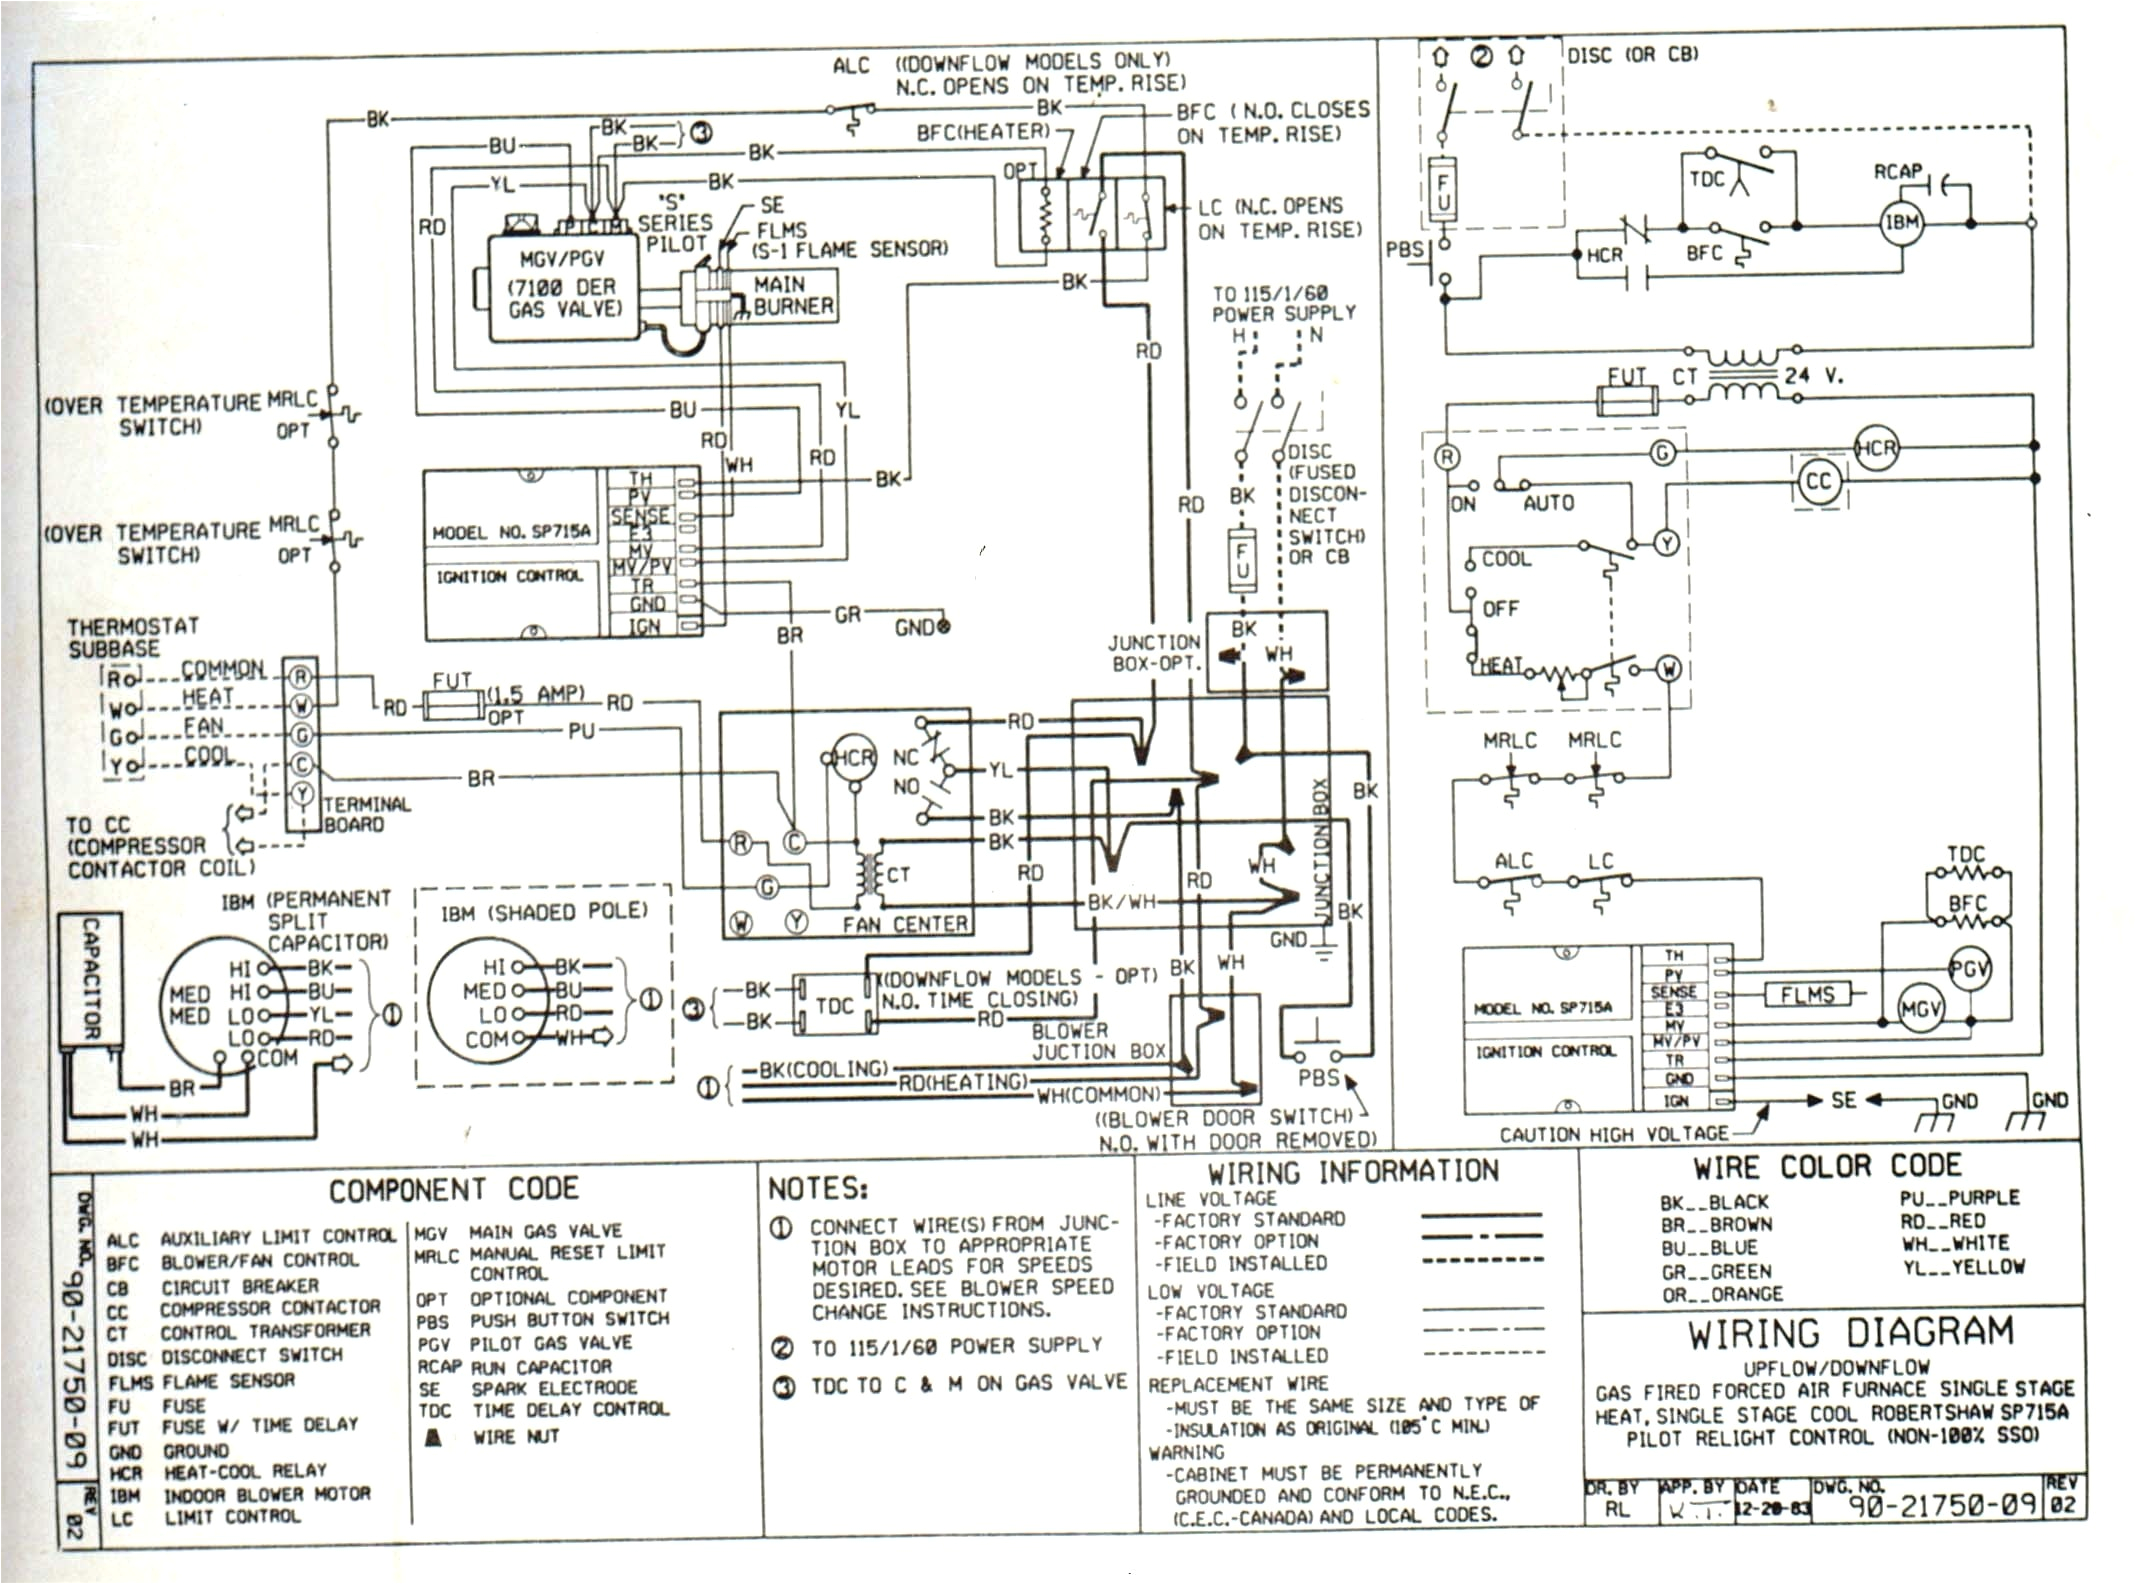 electric heat thermostat wiring diagram wiring diagram databaserheem heat pump thermostat wiring diagram